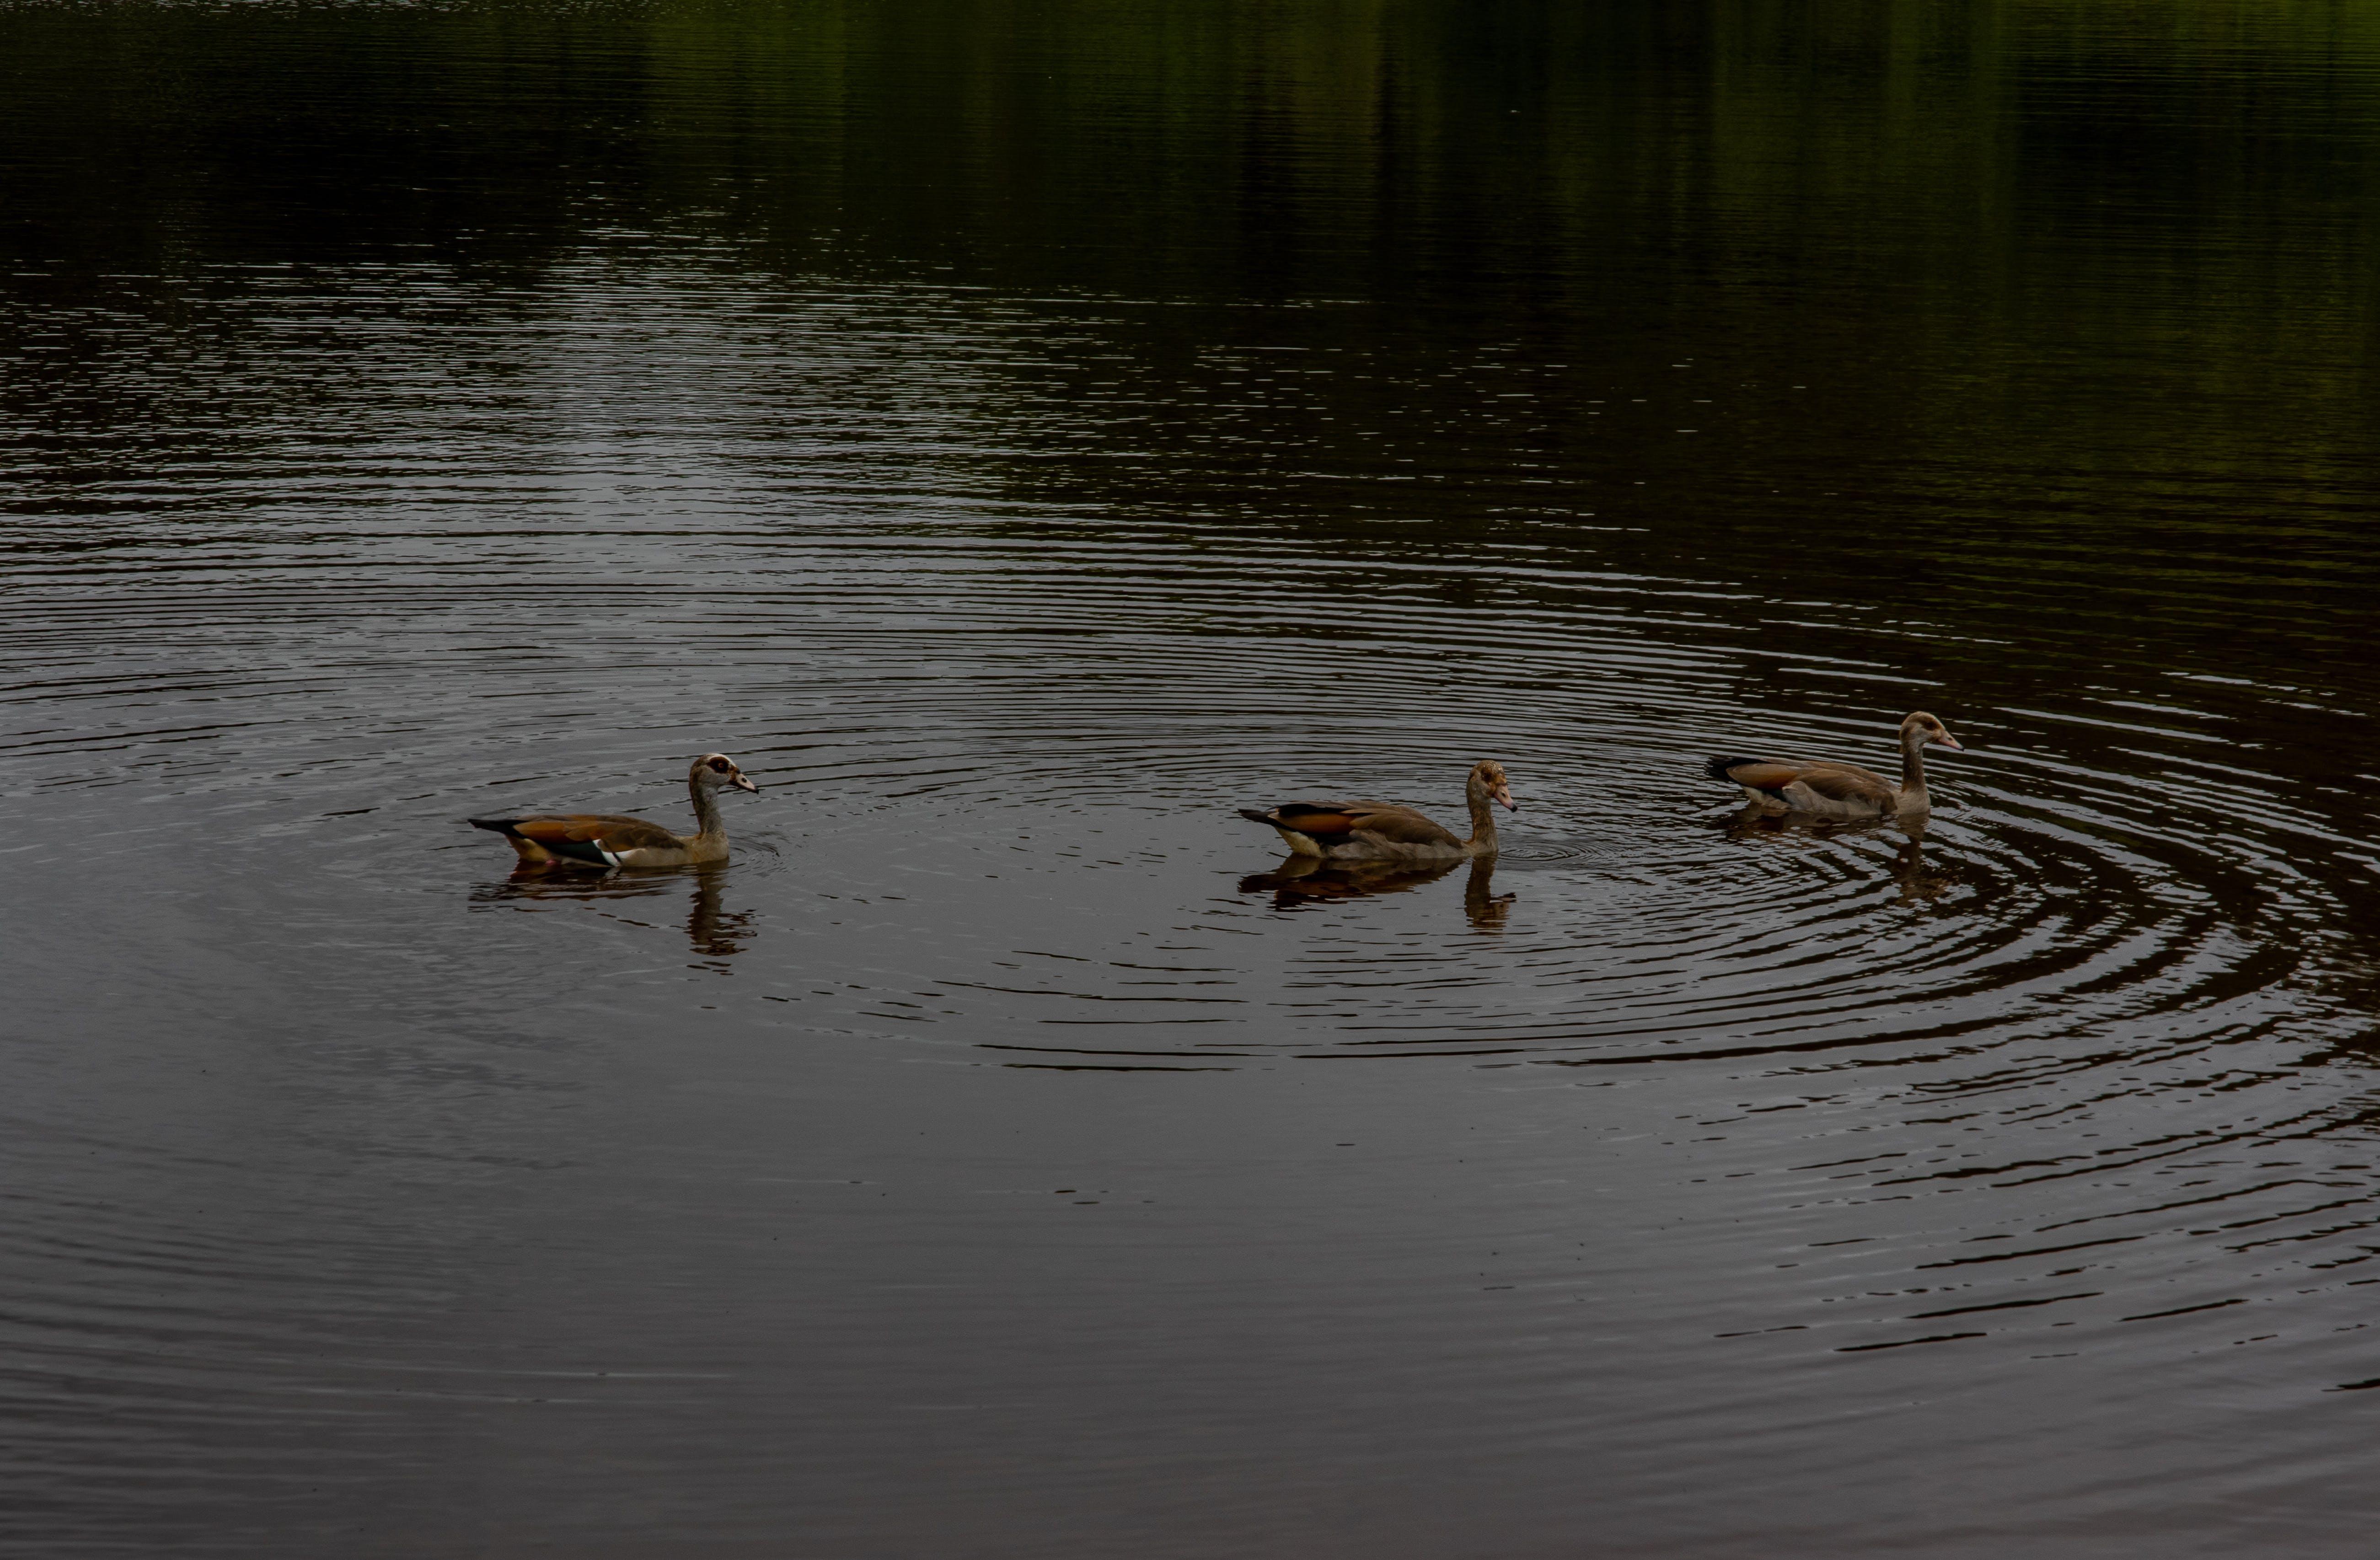 Free stock photo of animals, birds, country, ducks